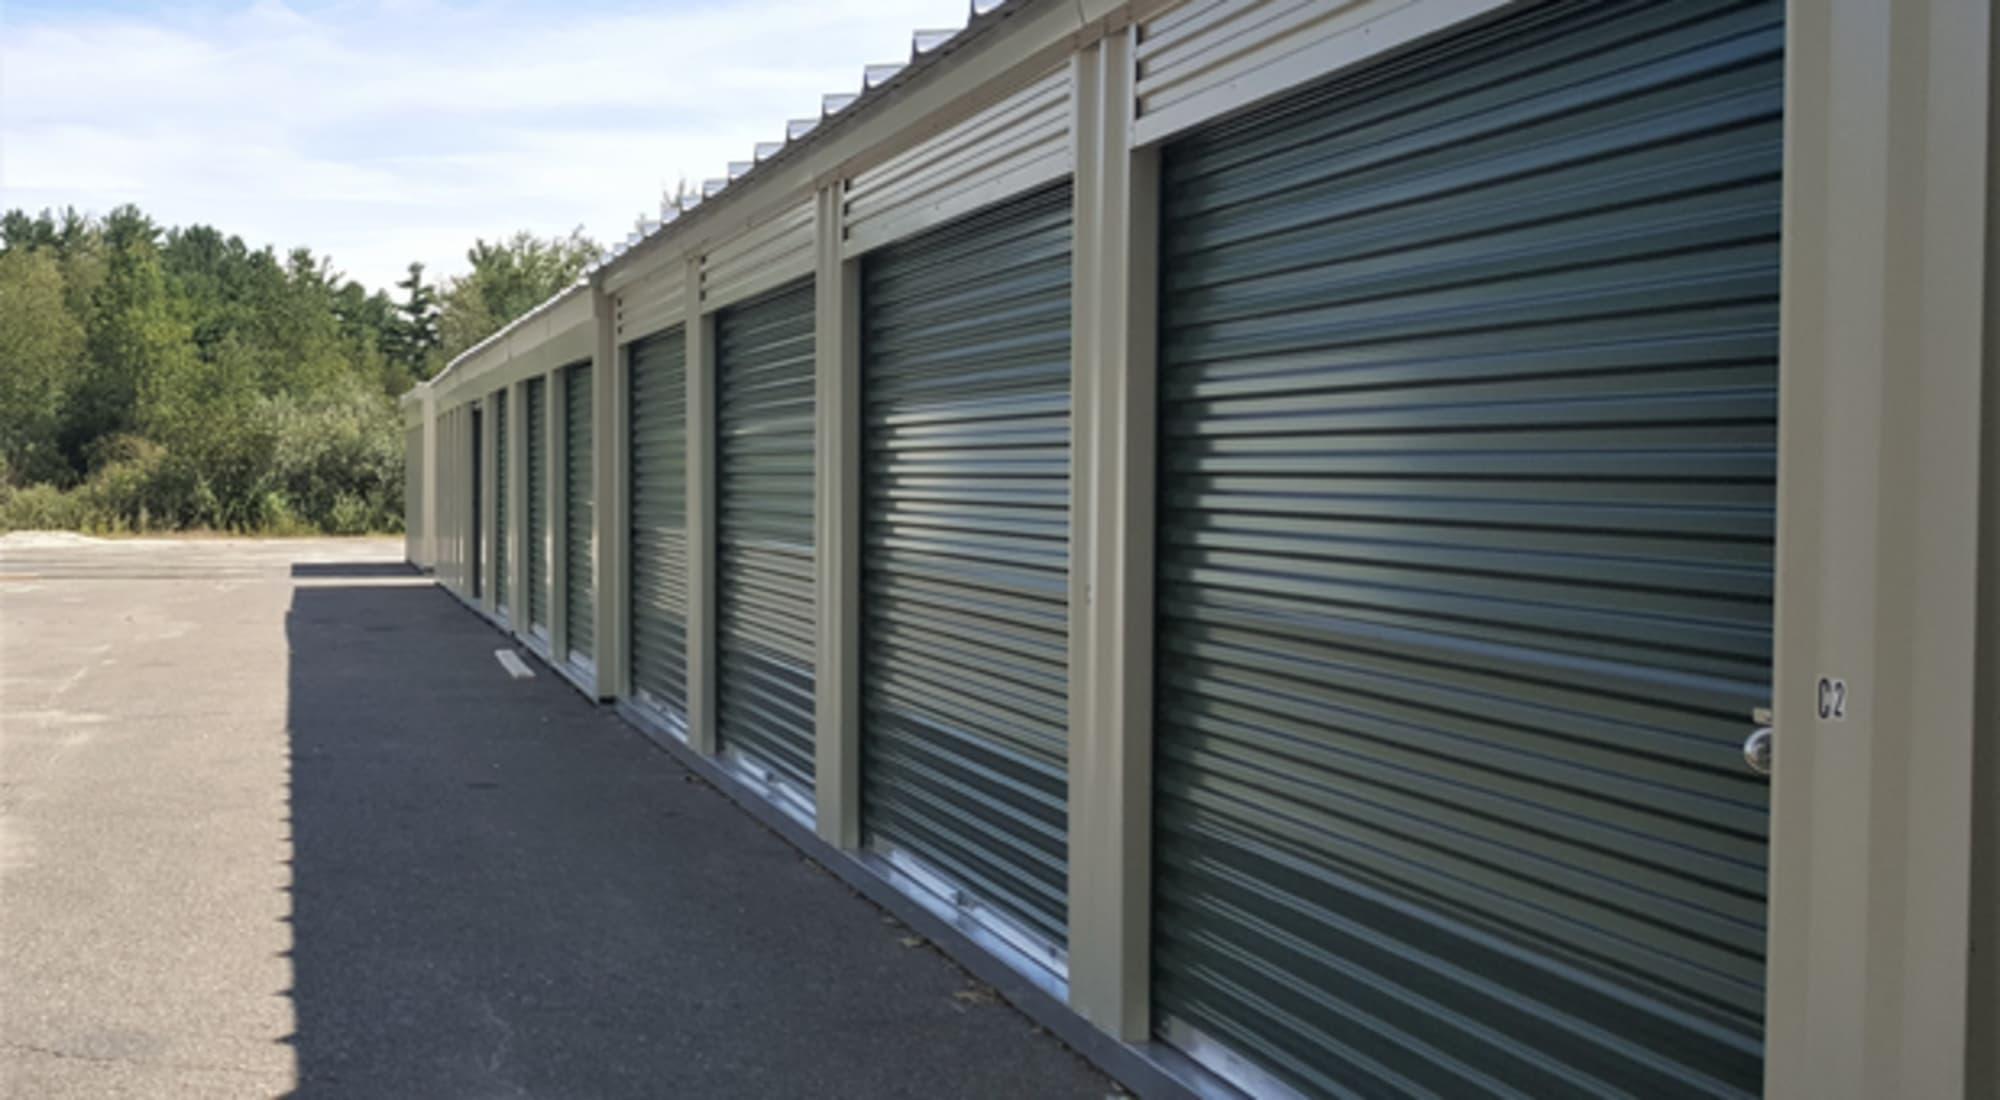 603 Storage - Candia self storage in Candia, New Hampshire